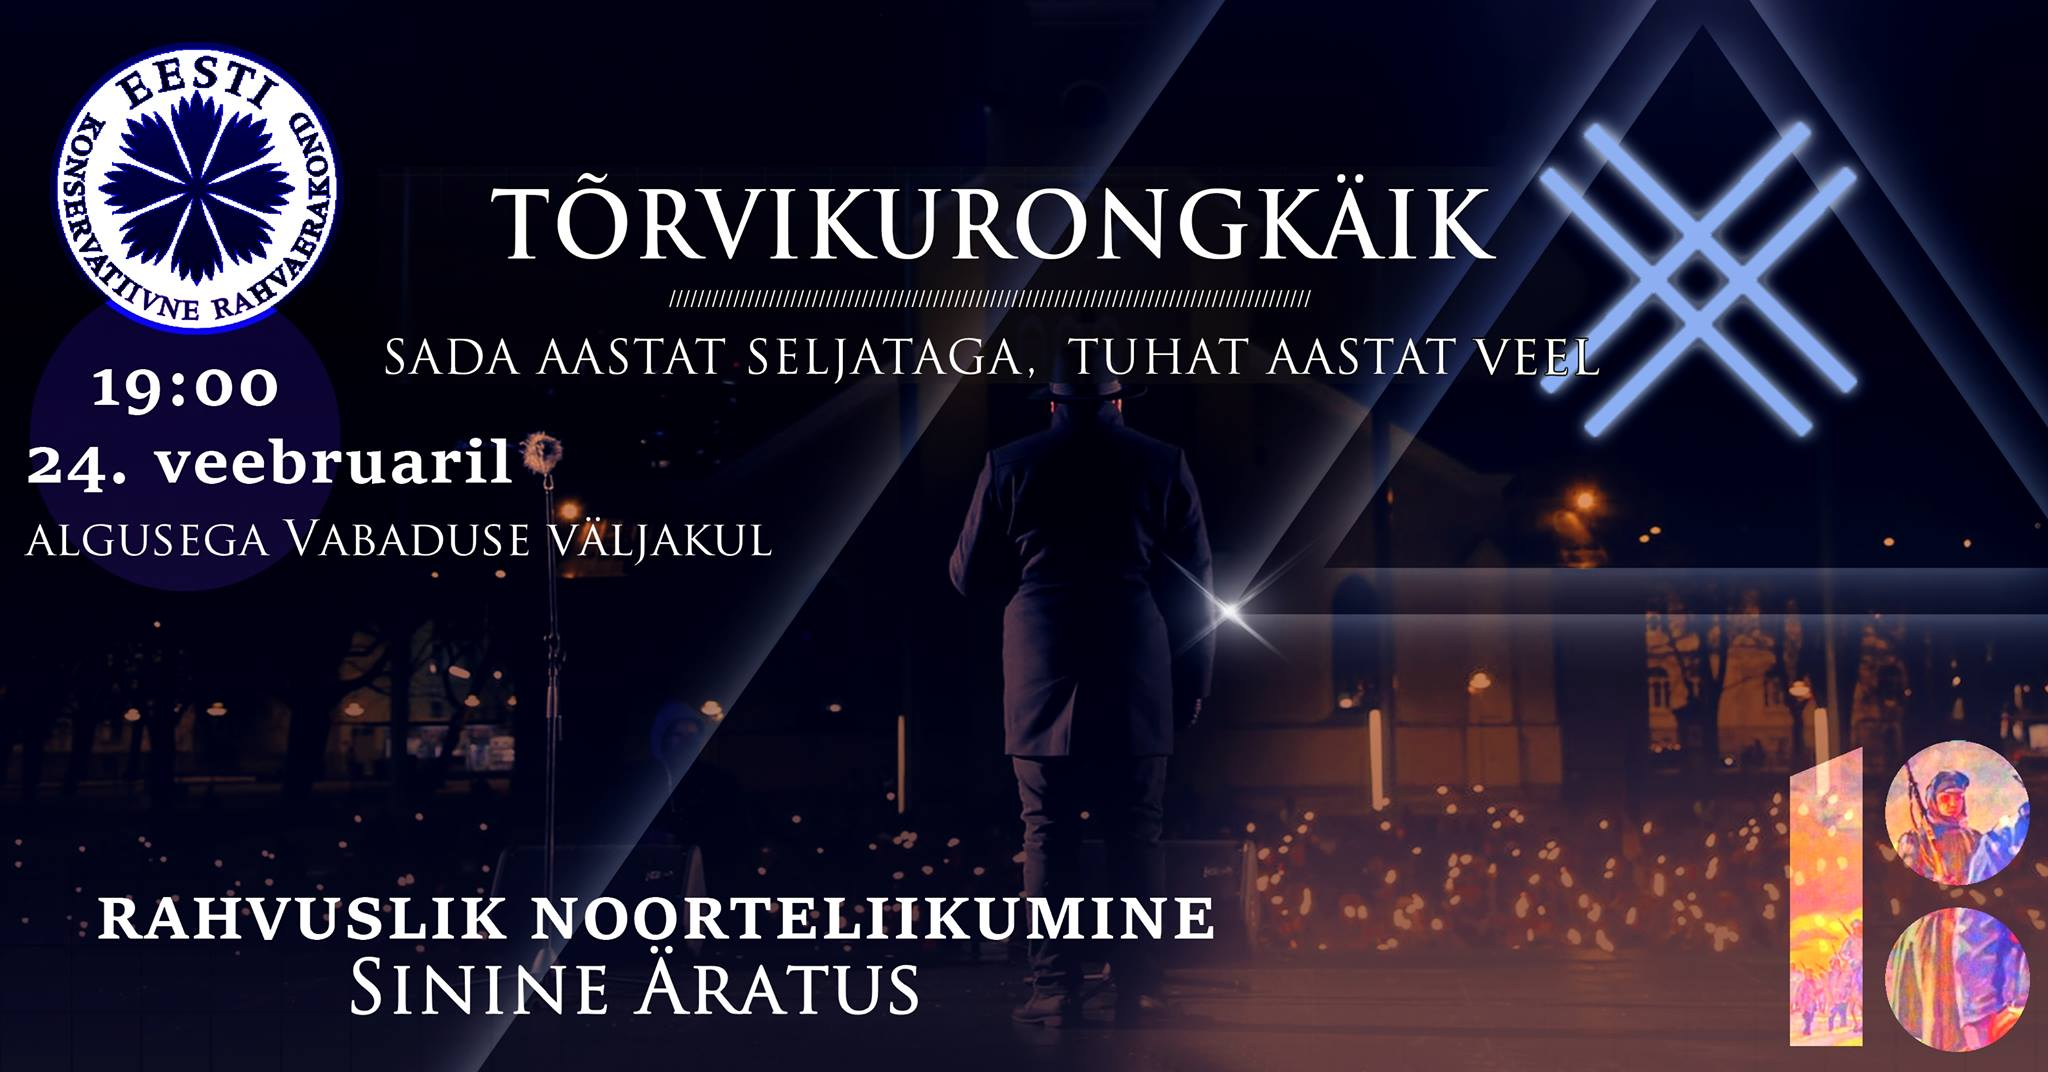 Tõrvikurongkäik: Eesti Vabariik 100